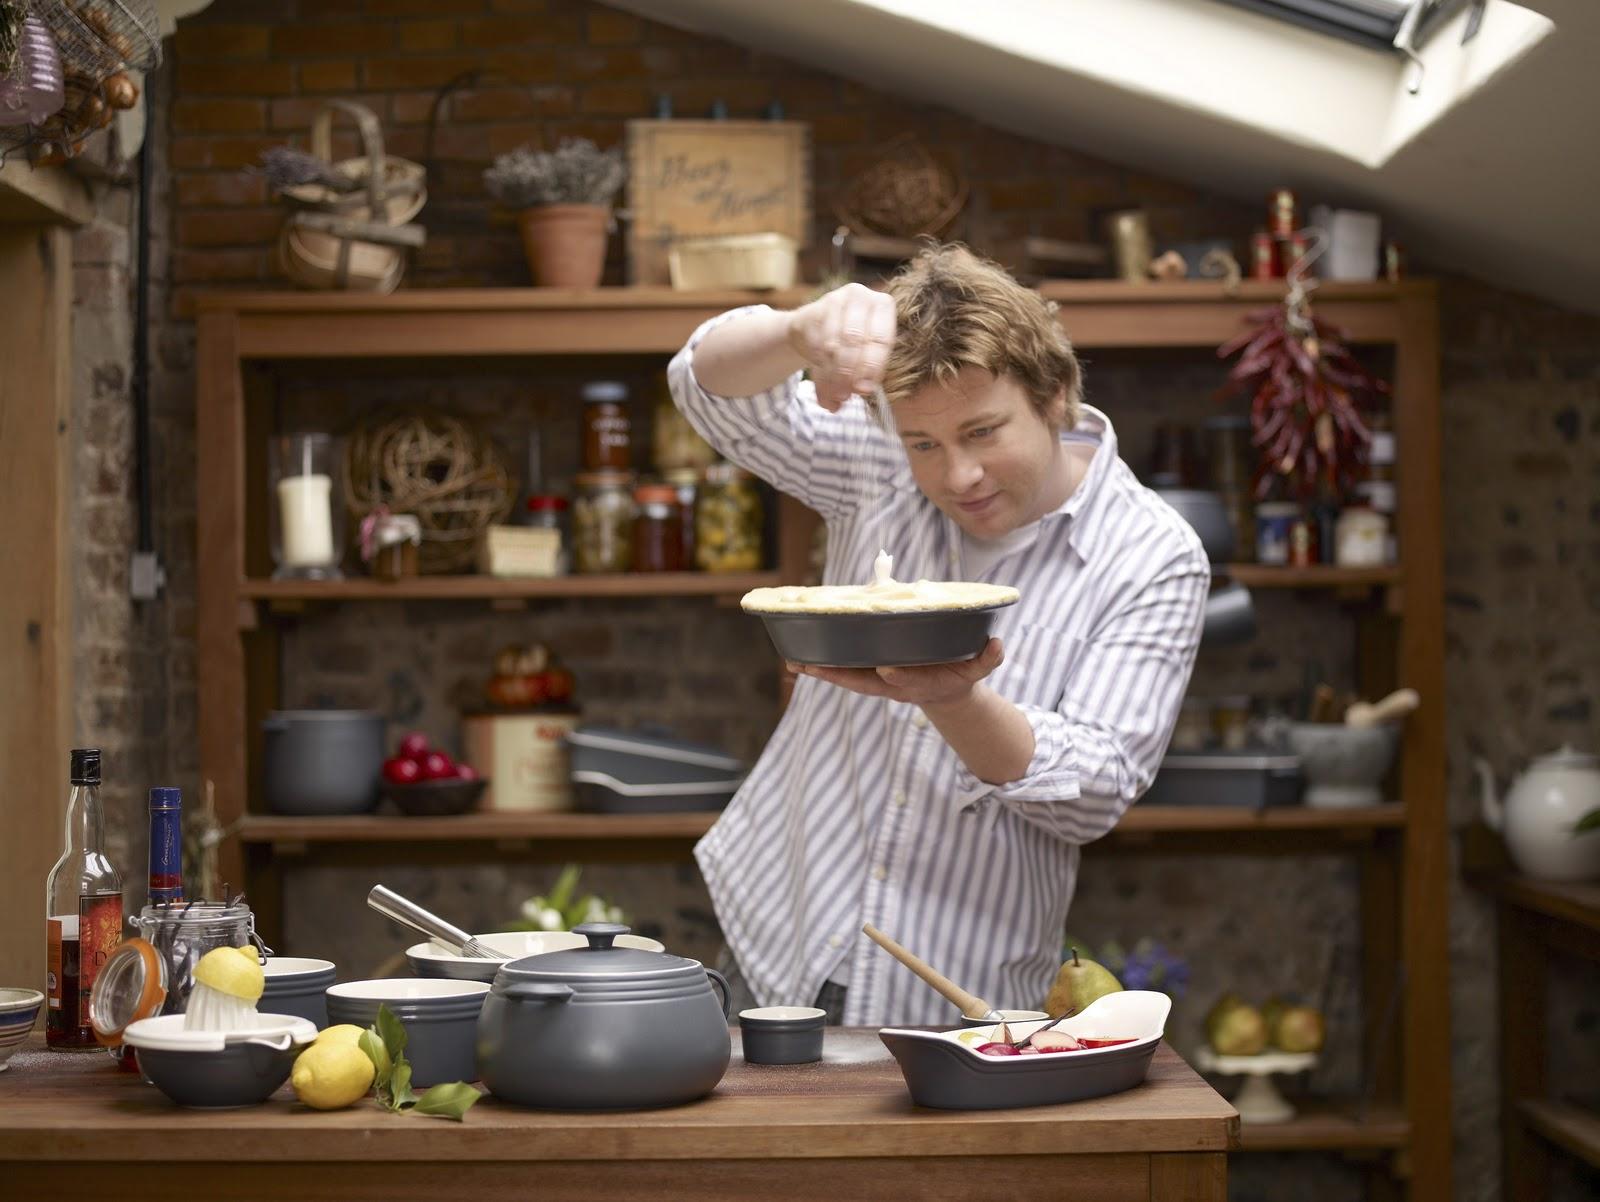 La cocina de evenstar jamie oliver la revoluci n for Jamie oliver utensilios de cocina